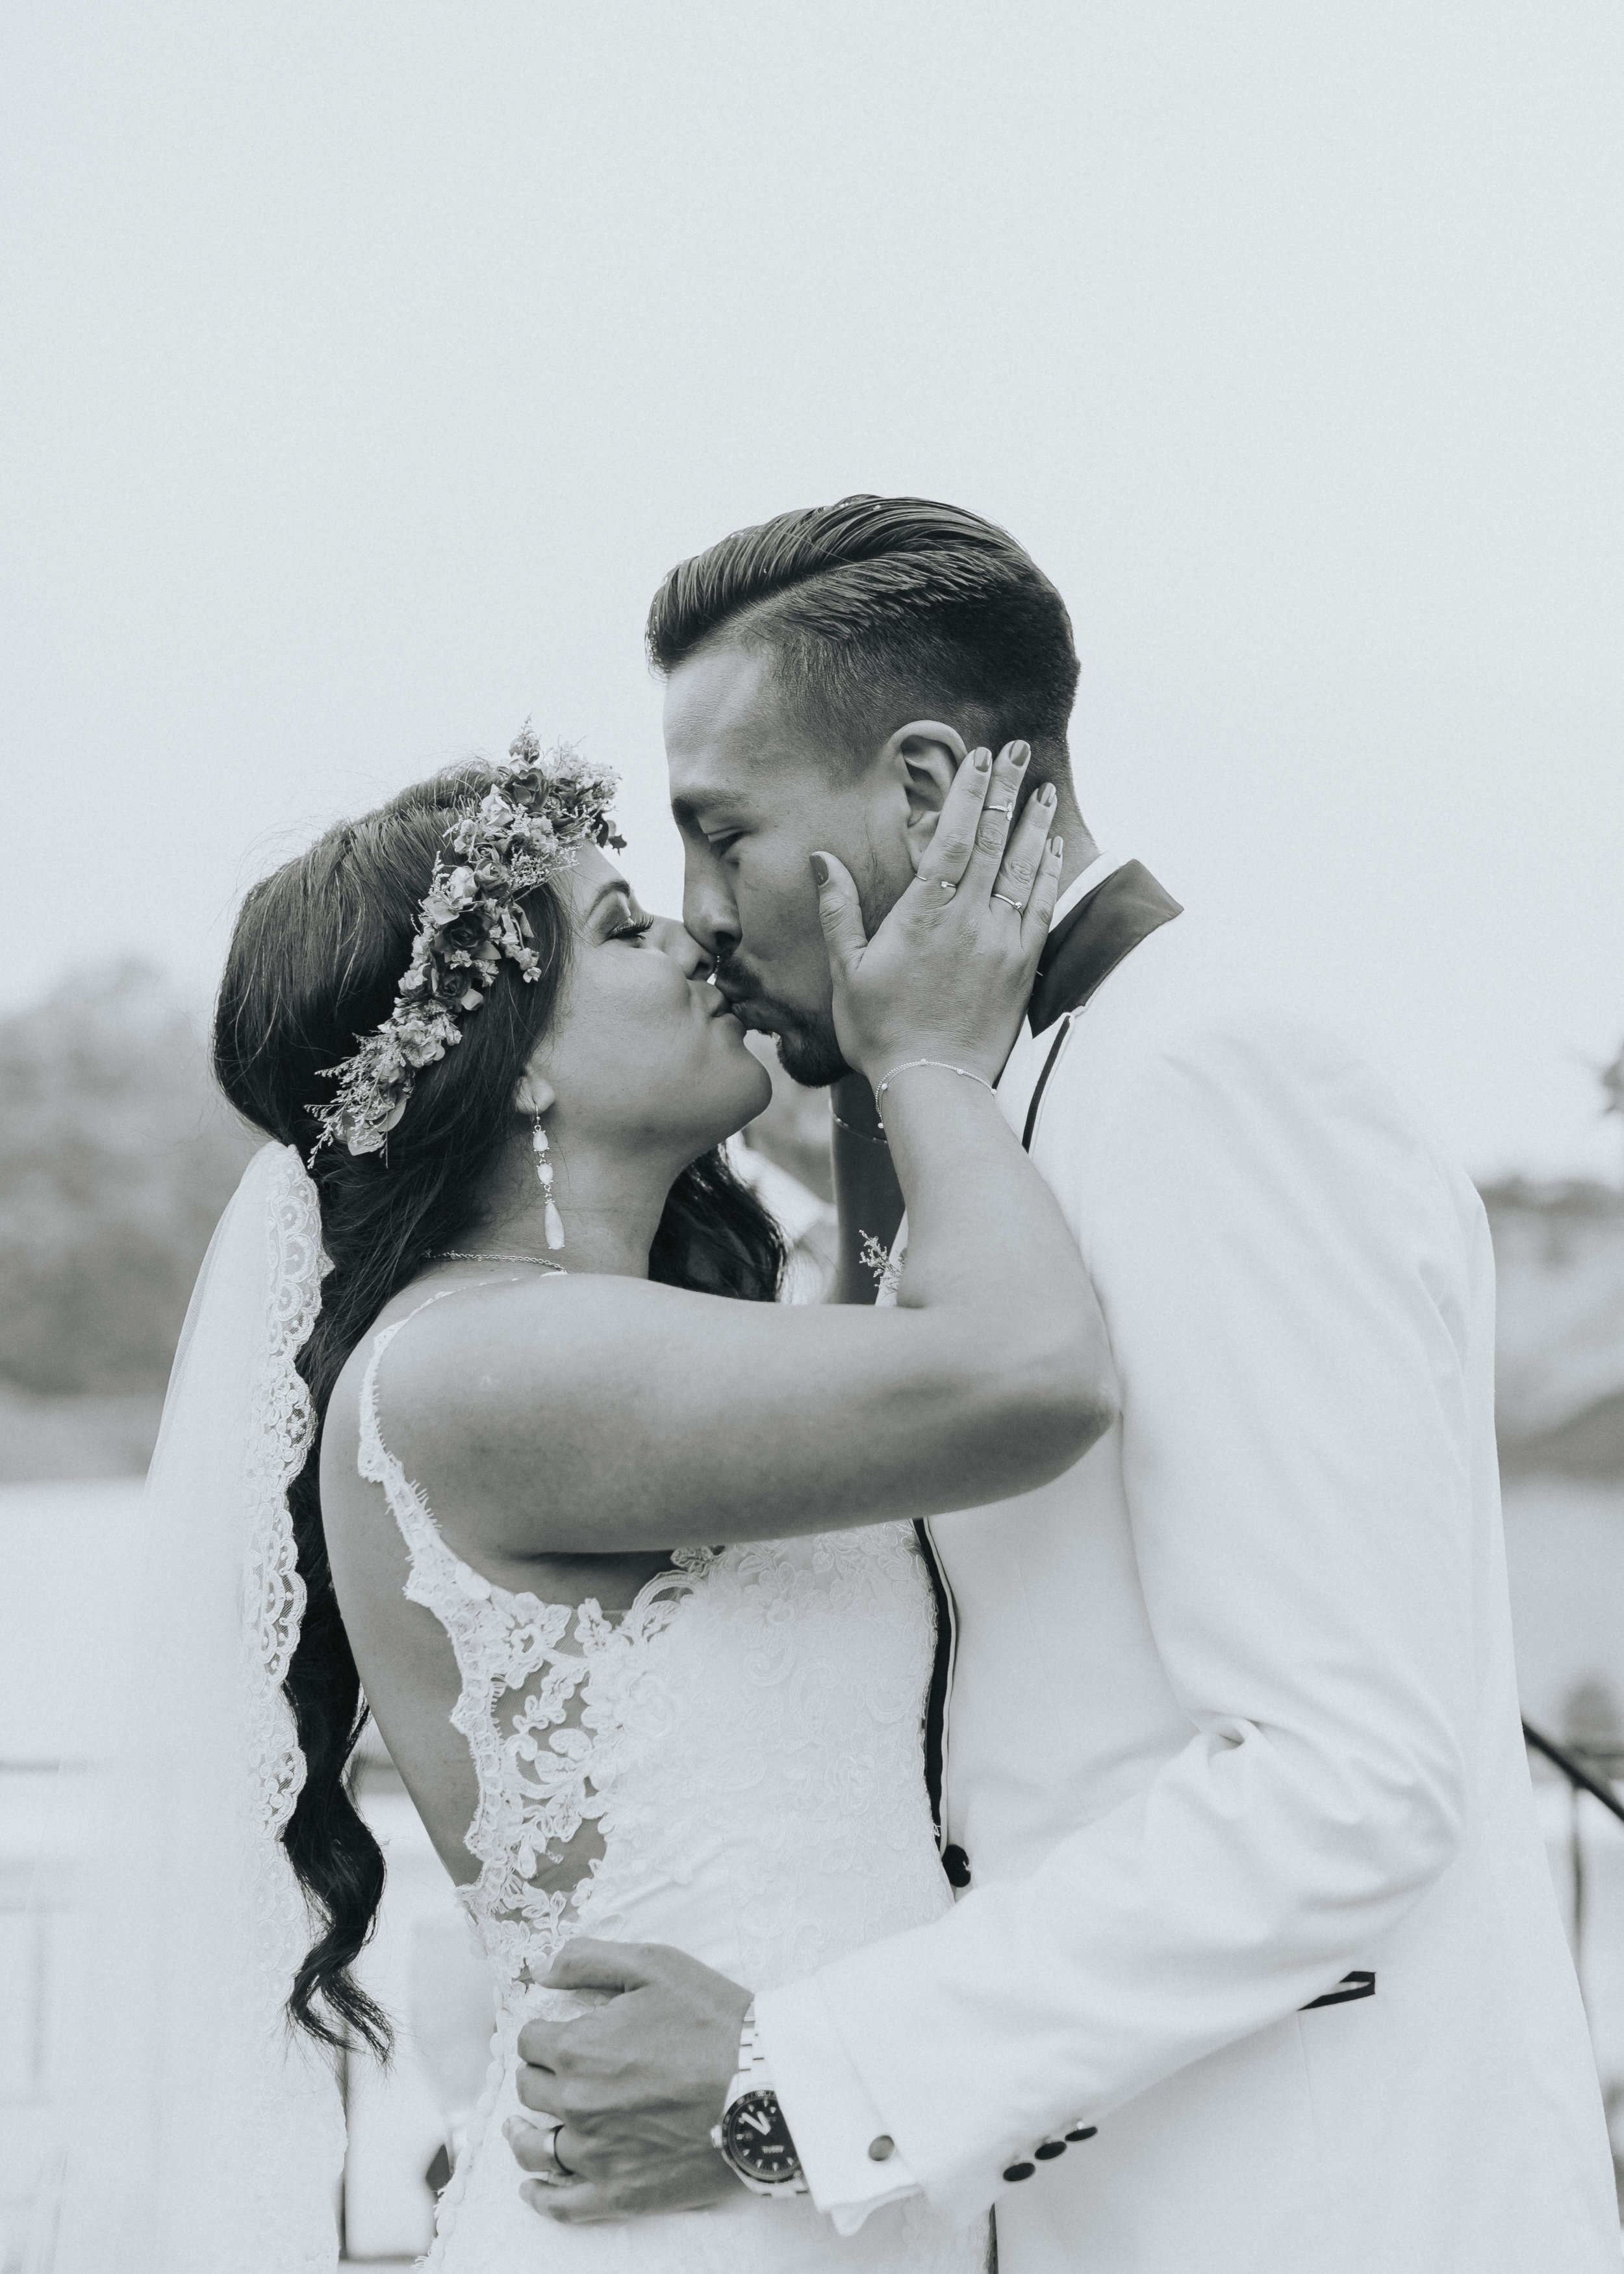 Crista and Alvaro's first kiss.